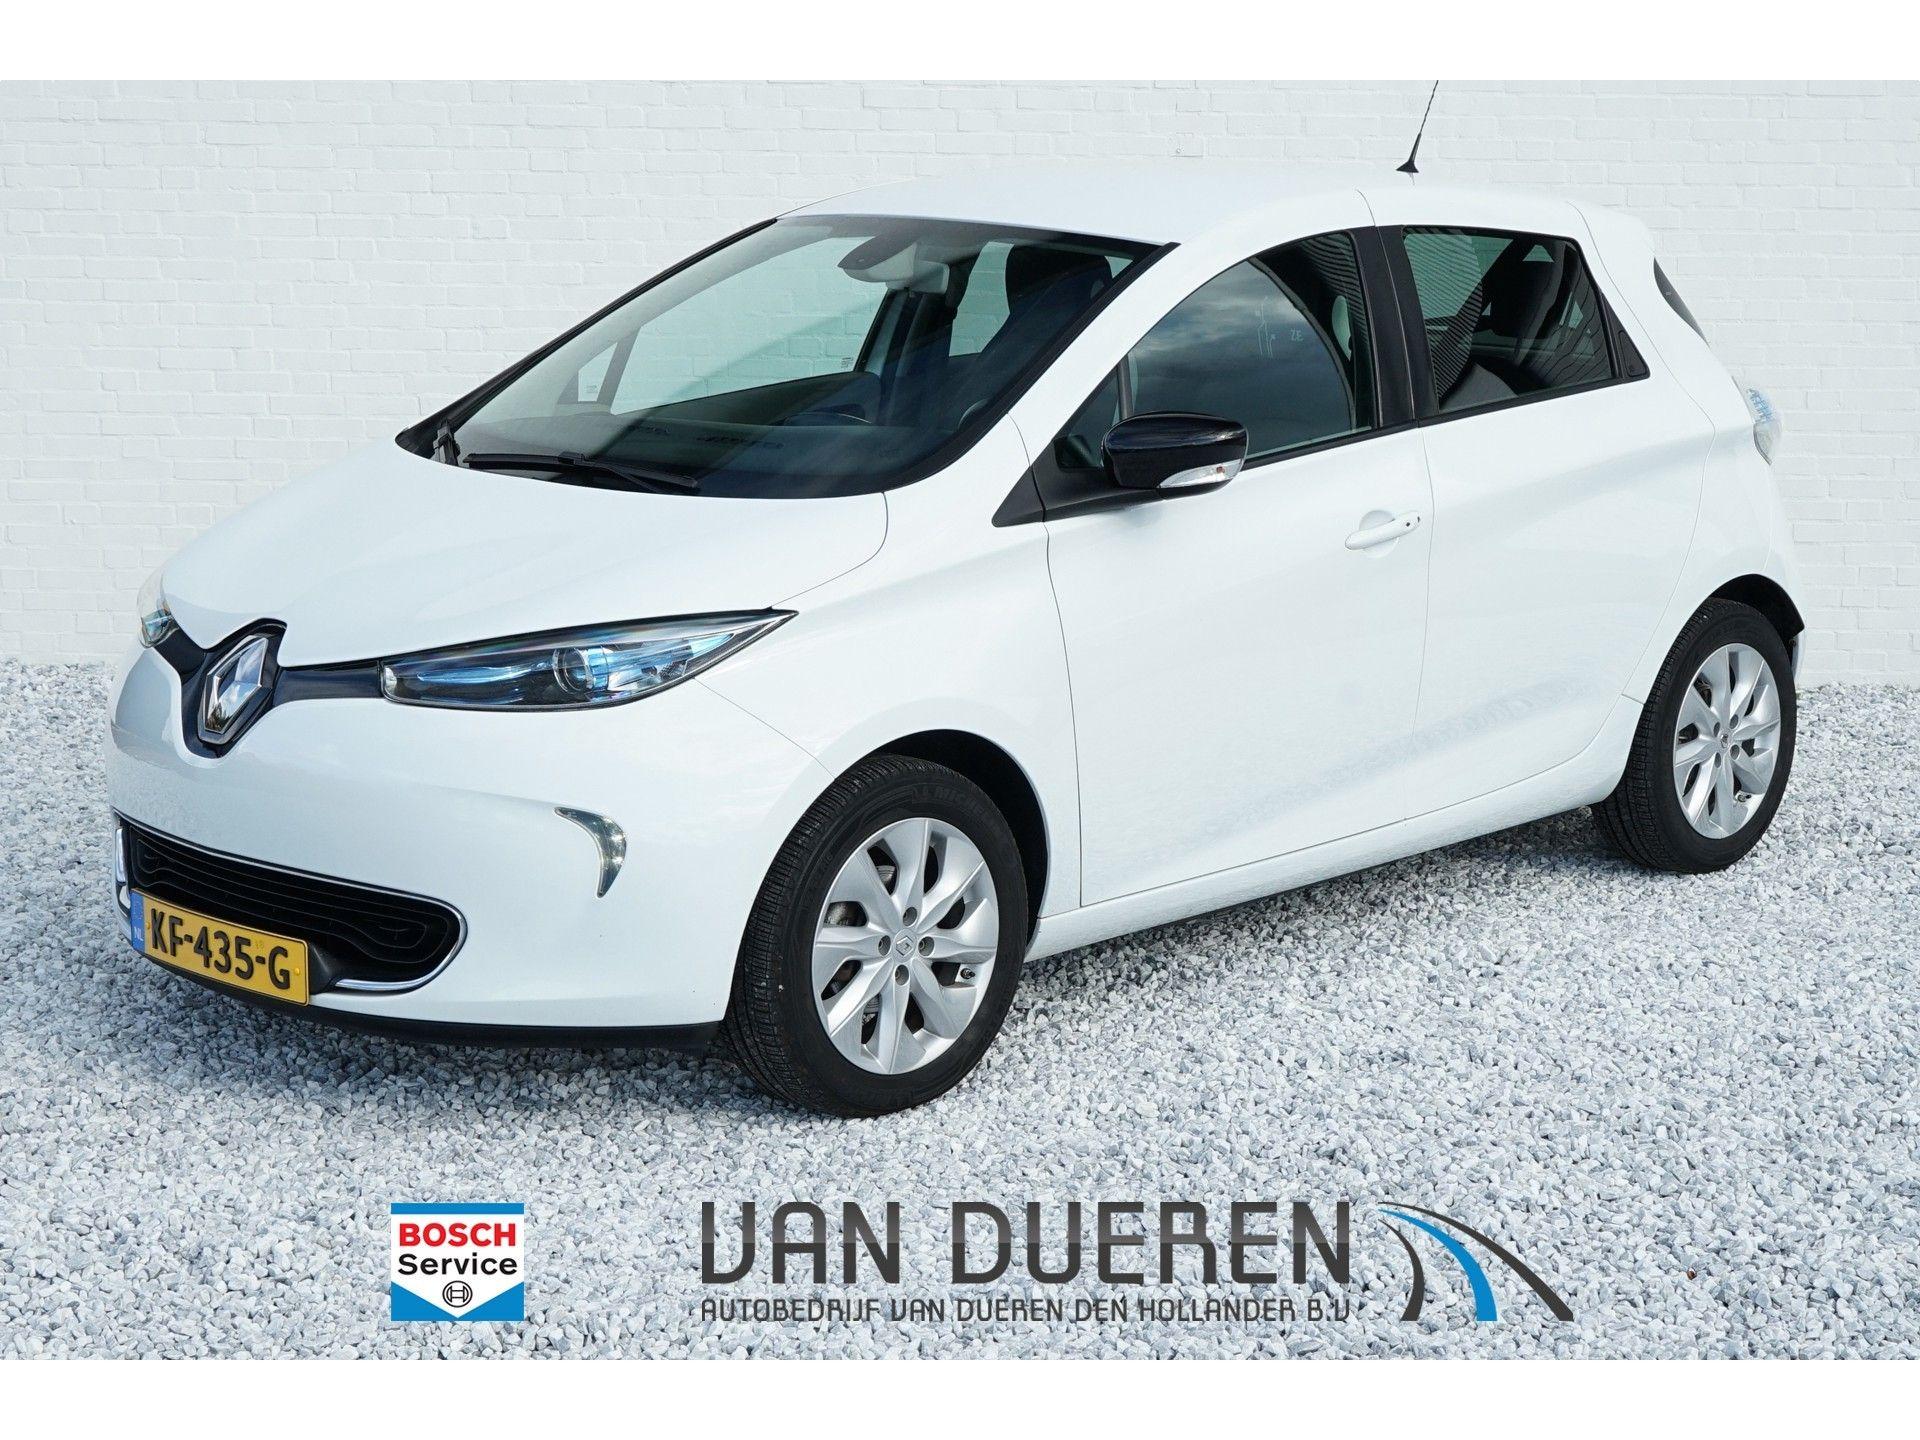 Renault Zoe Q210 Intens Quickcharge 22 kWh (ex Accu)